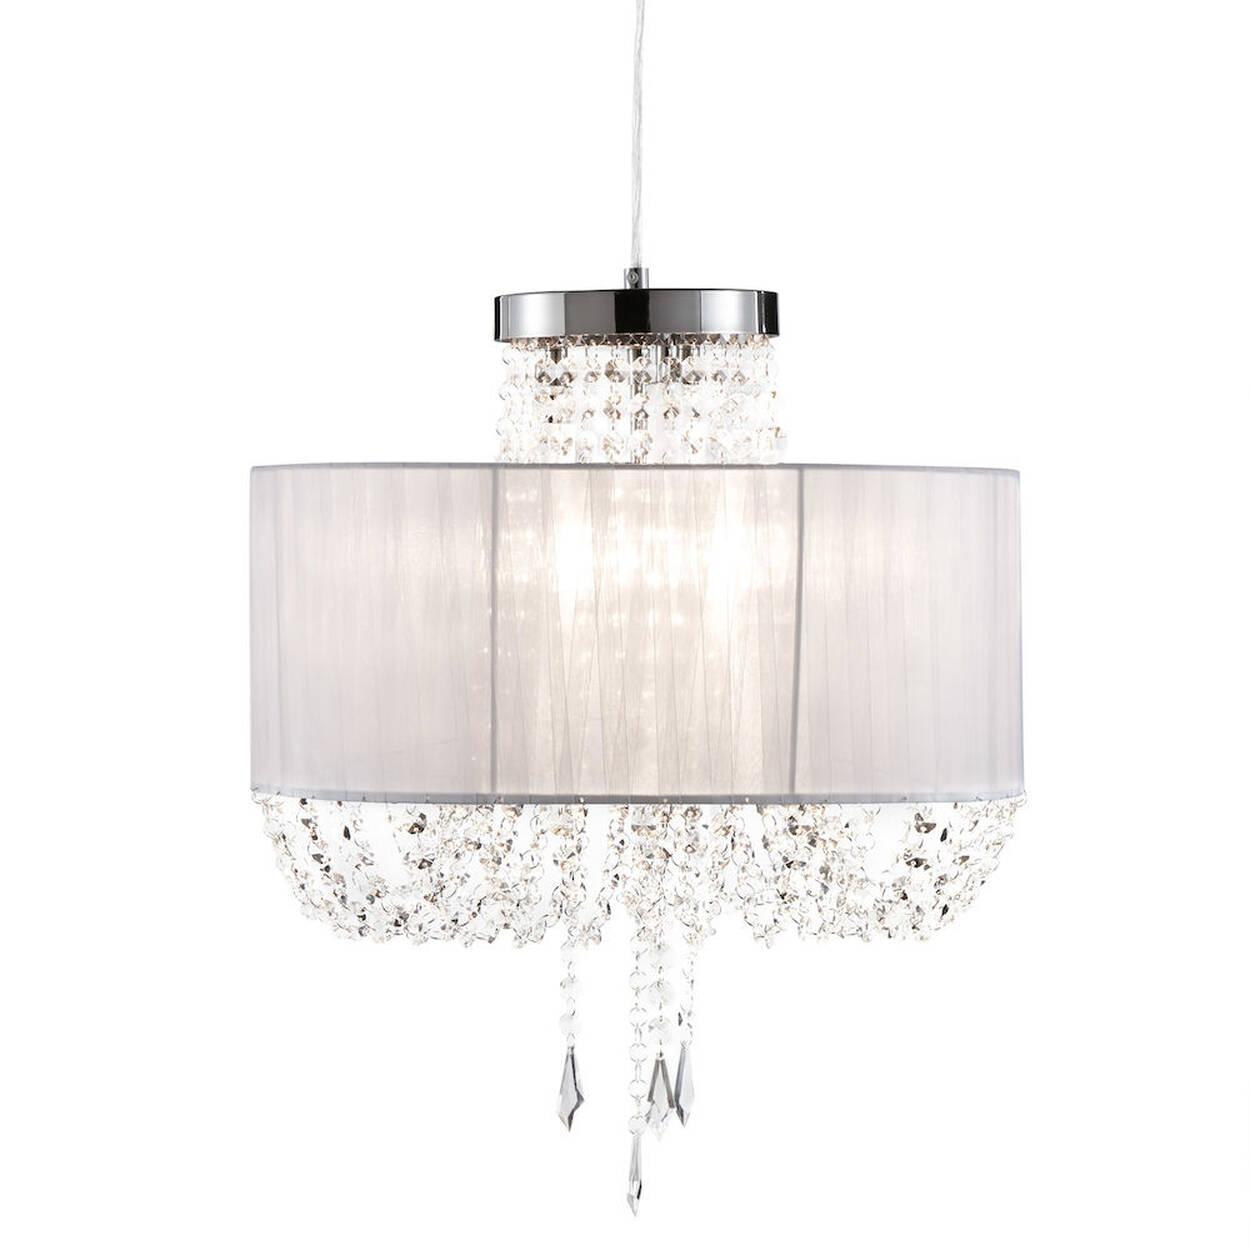 Ribbon & Droplets Ceiling Lamp